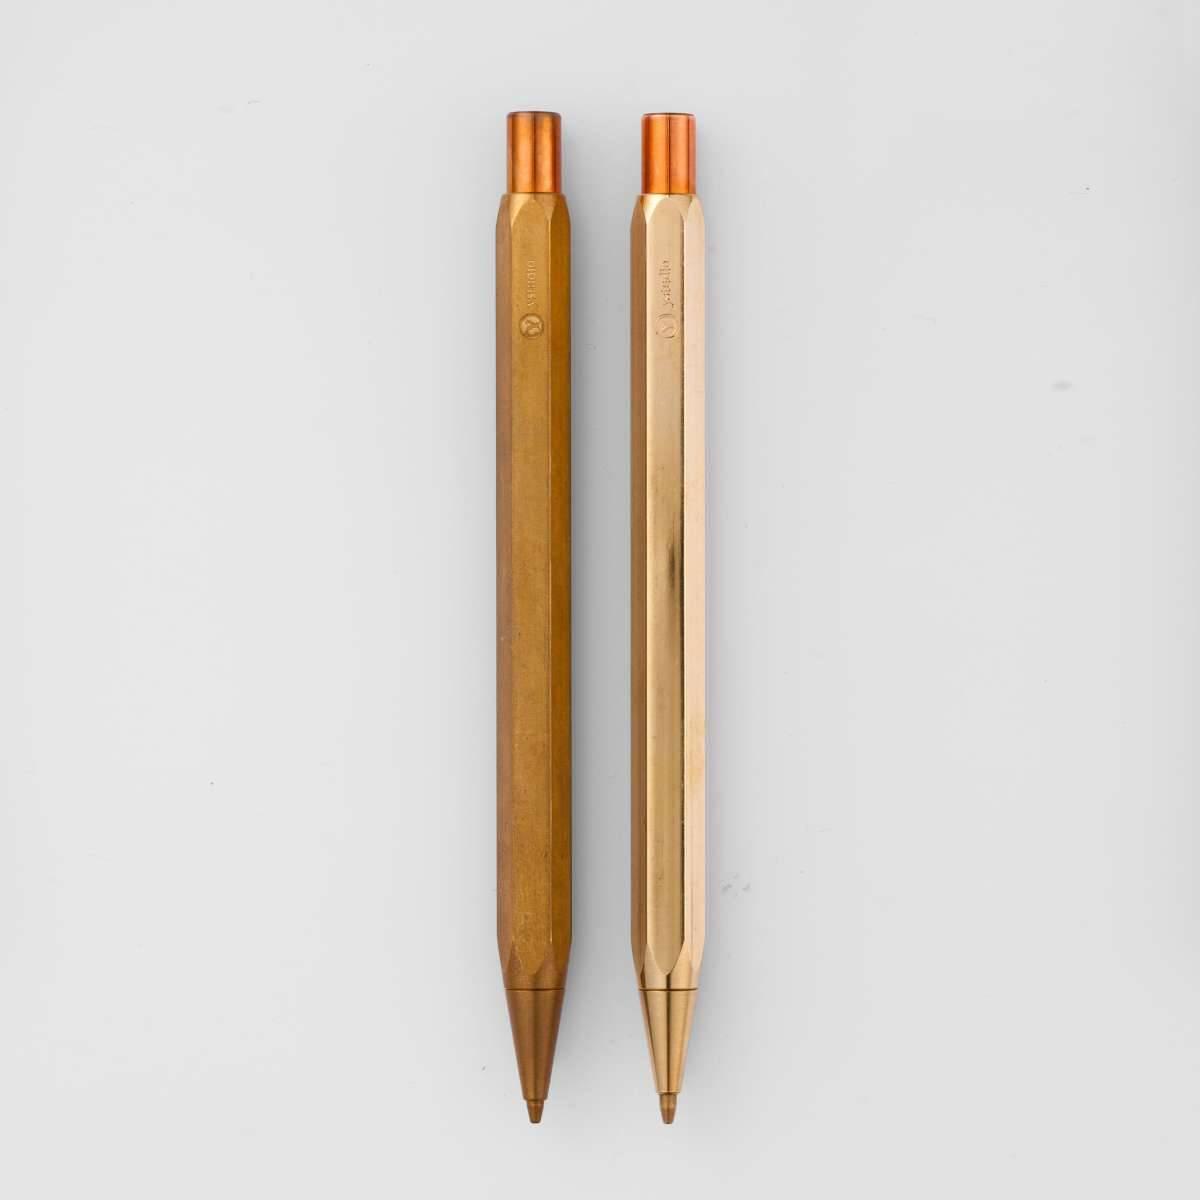 Ystudio mechanical pencils